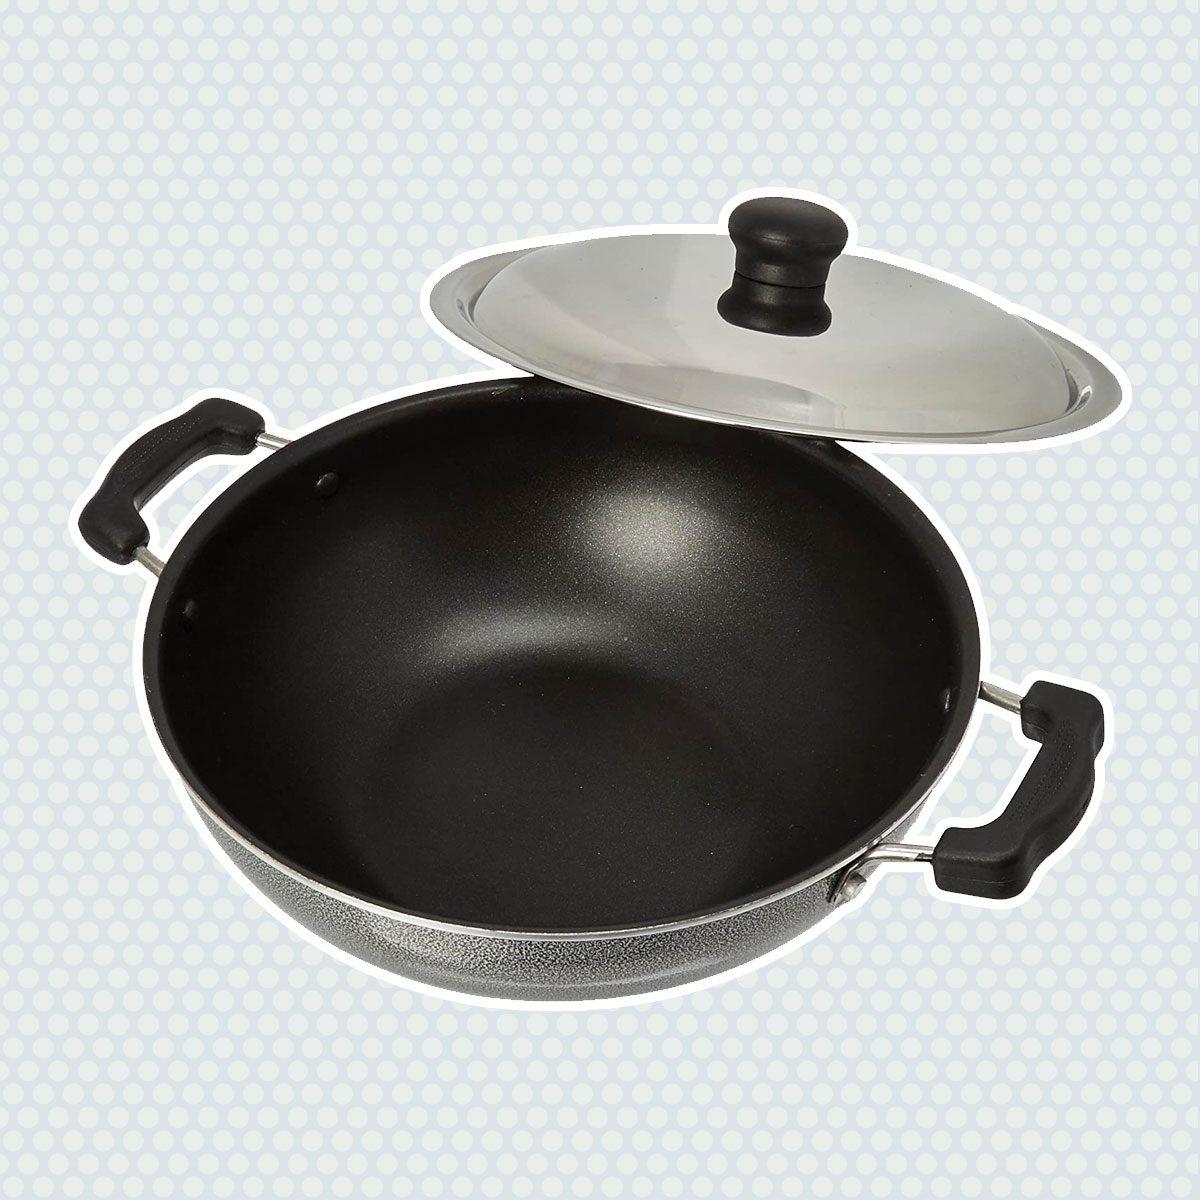 Prestige Manttra Omega Select Plus 200 Deep fry pan, Kadai, Indian kadhai, Medium, Black